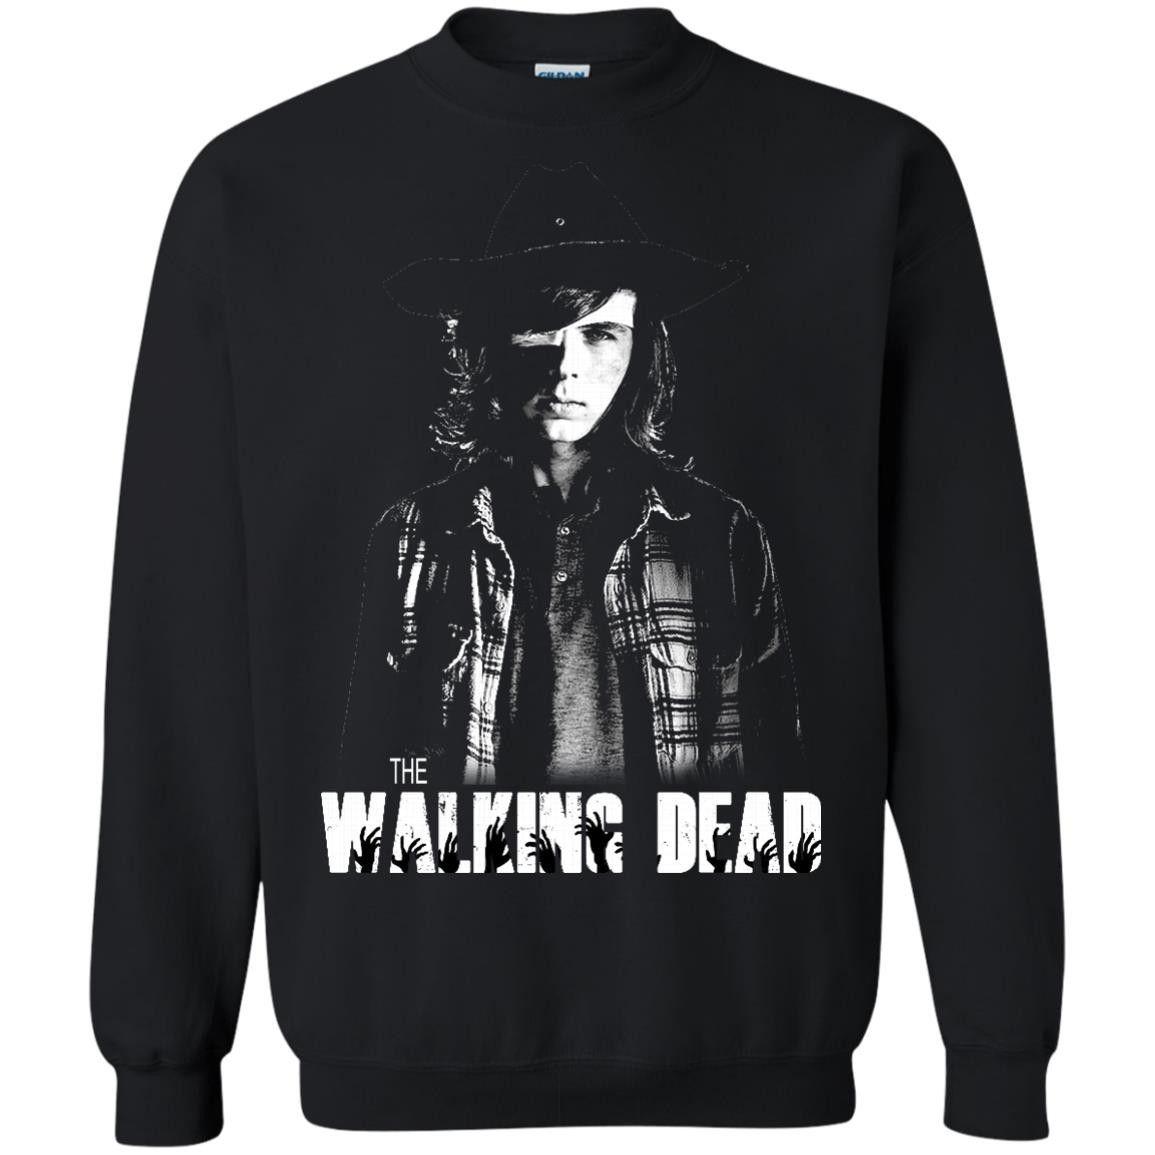 The Walking Dead Carl Grimes T Shirts Hoodies Sweatshirts Hoodie Shirt Sweatshirts Sweatshirts Hoodie [ 1155 x 1155 Pixel ]